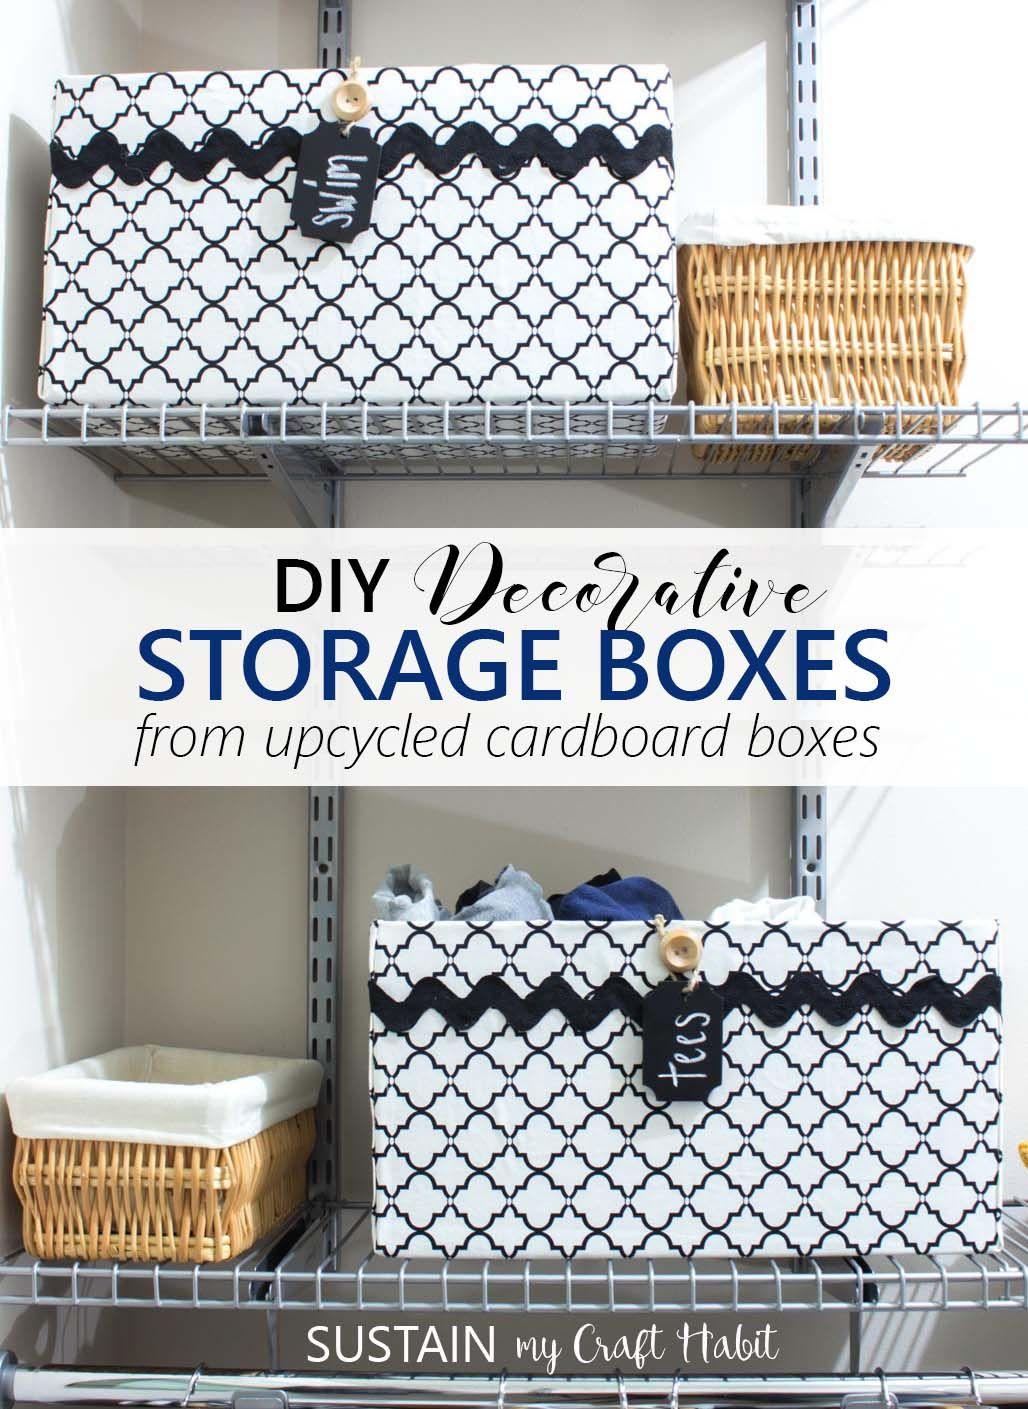 Upcycling a Cardboard Box into a Stylish DIY Storage Box